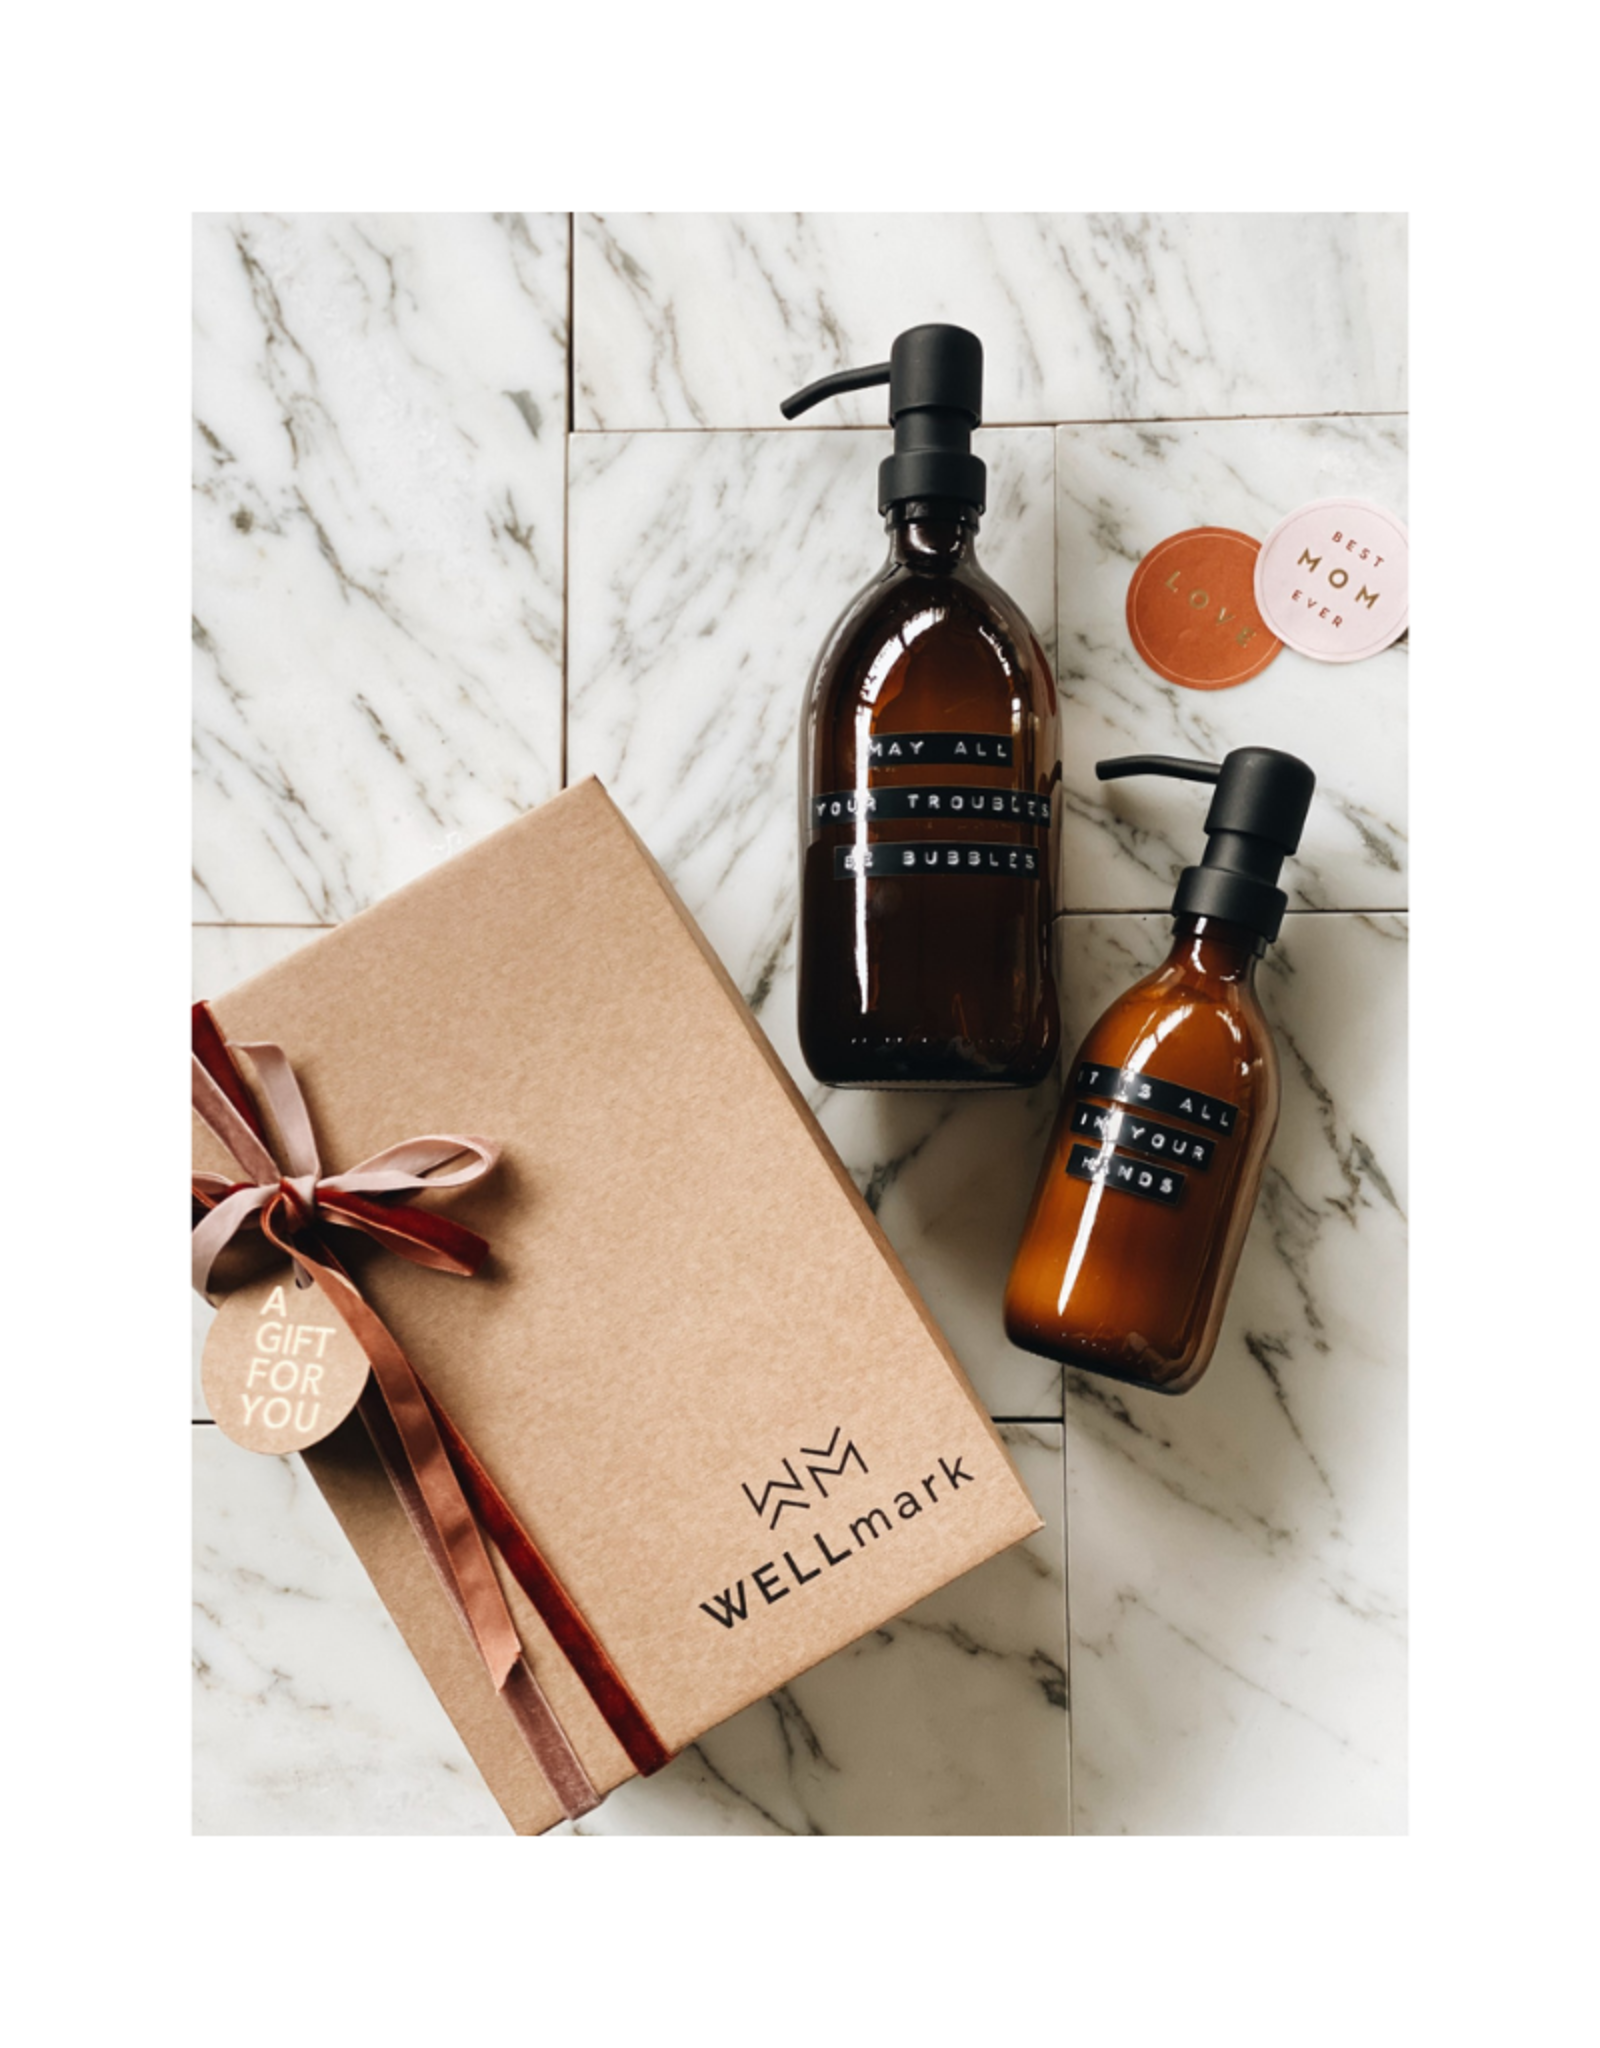 Wellmark Giftbox 2 pieces: Handzeep & Handcrème